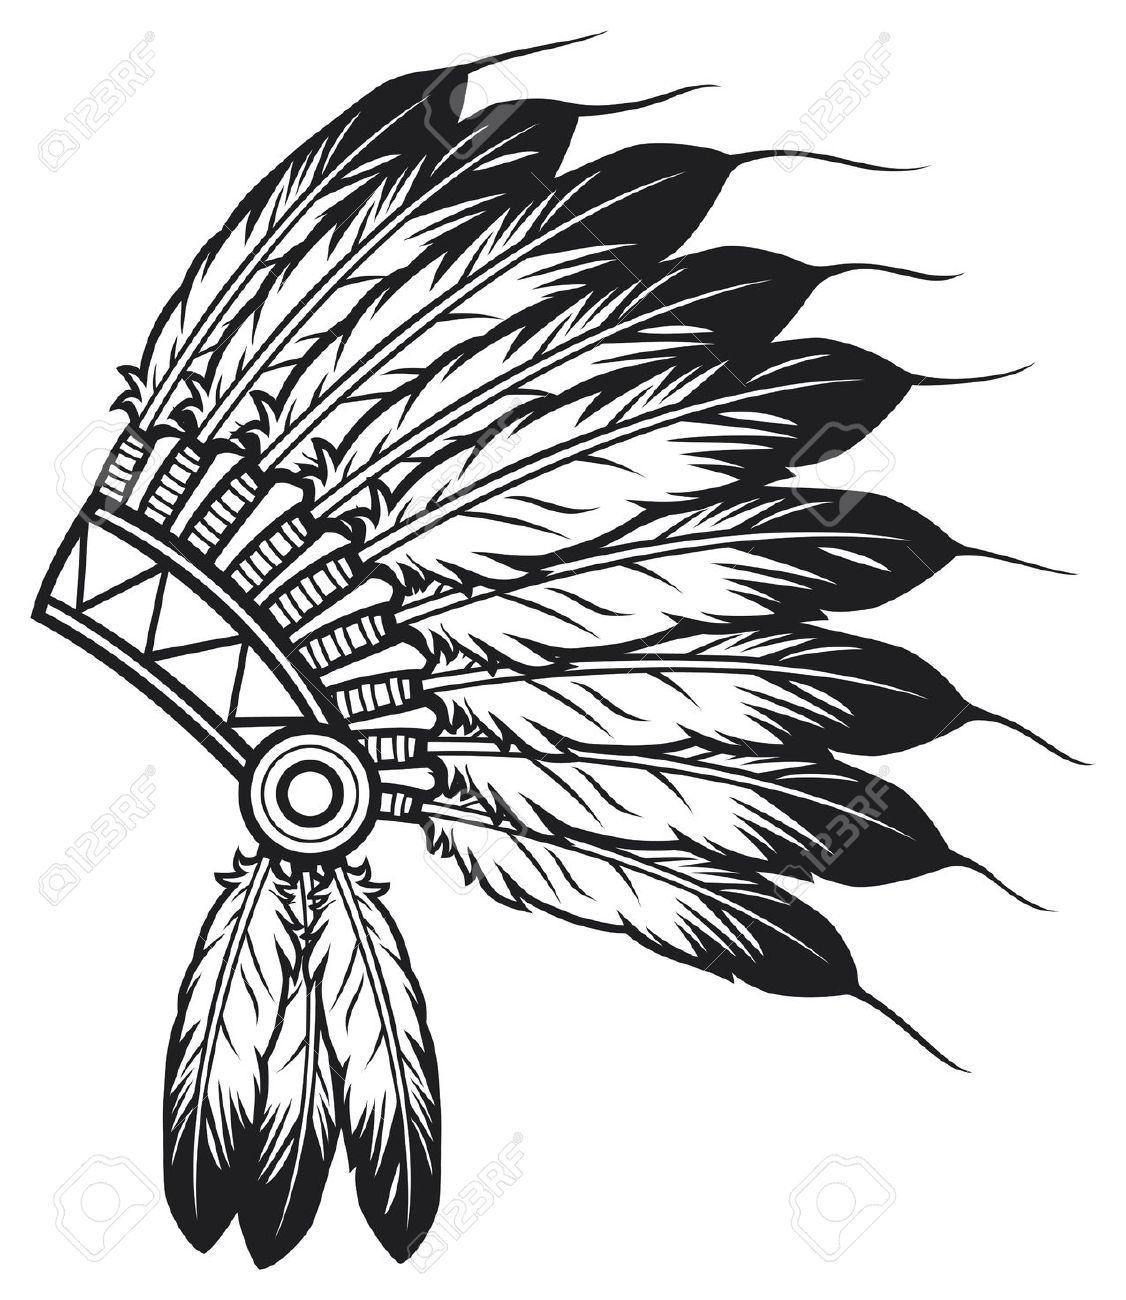 Indian Chief Headdress